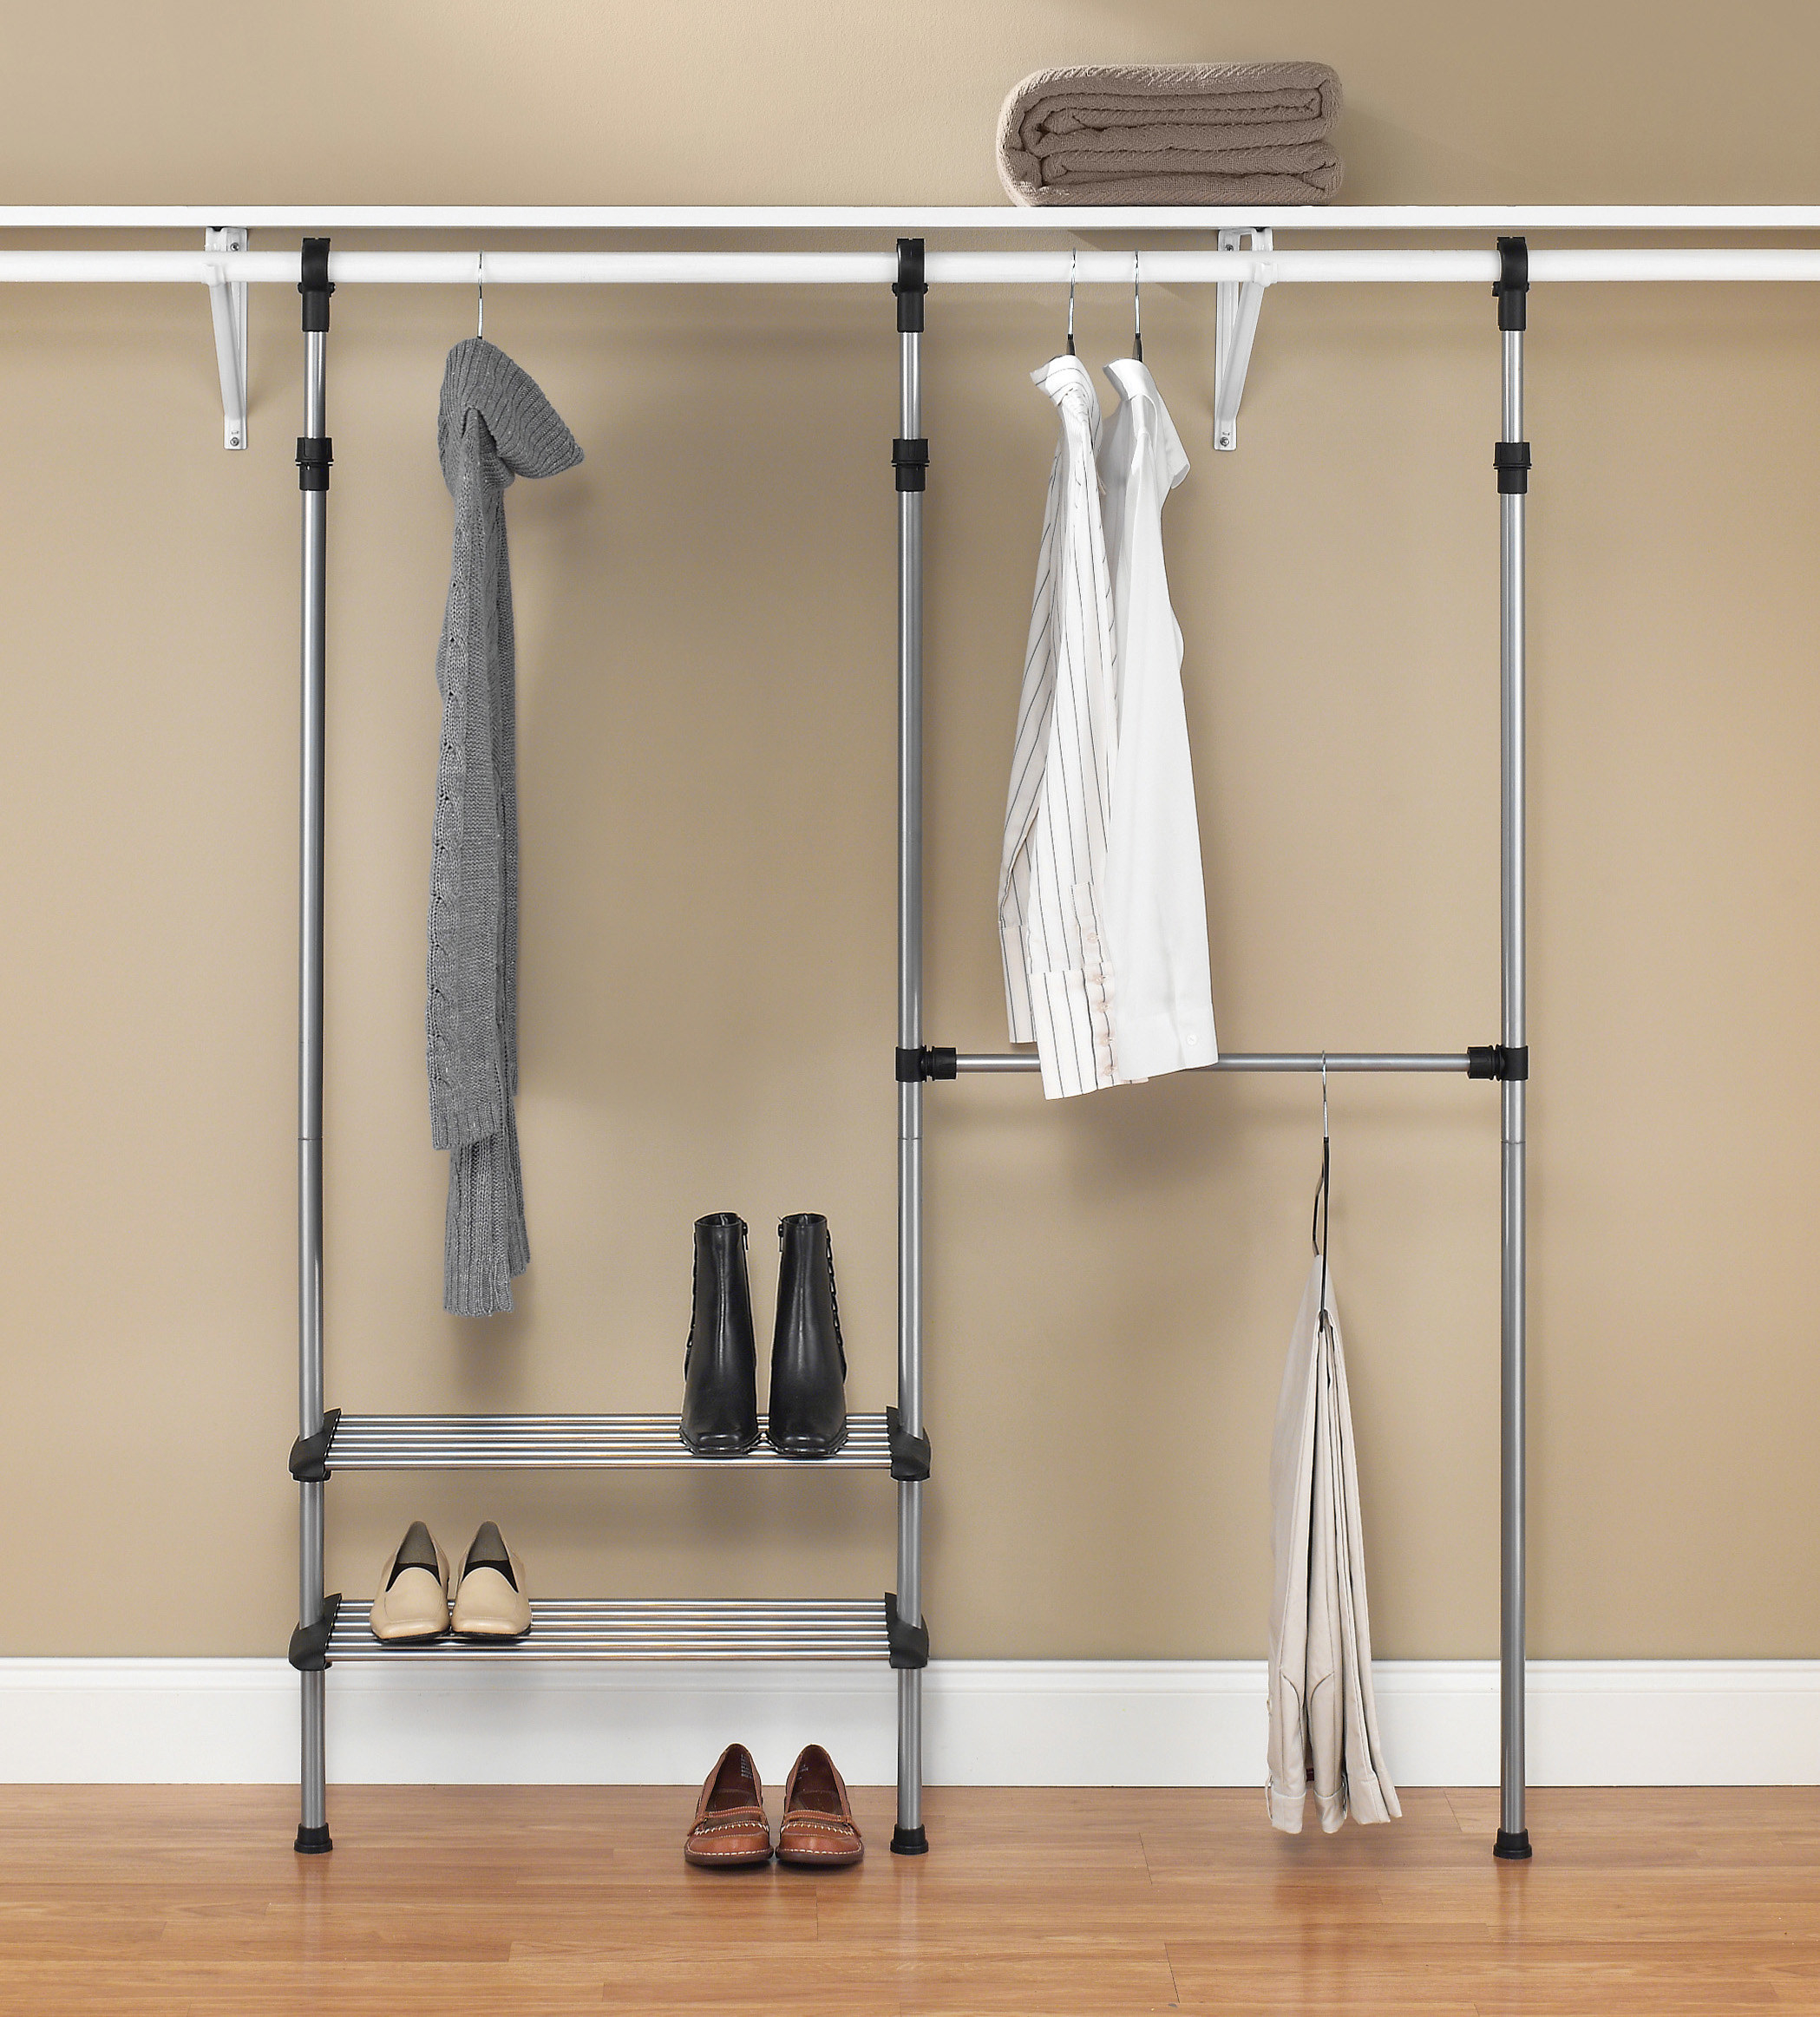 Thetwo-shelf, two-rod adjustable steel closet organizer